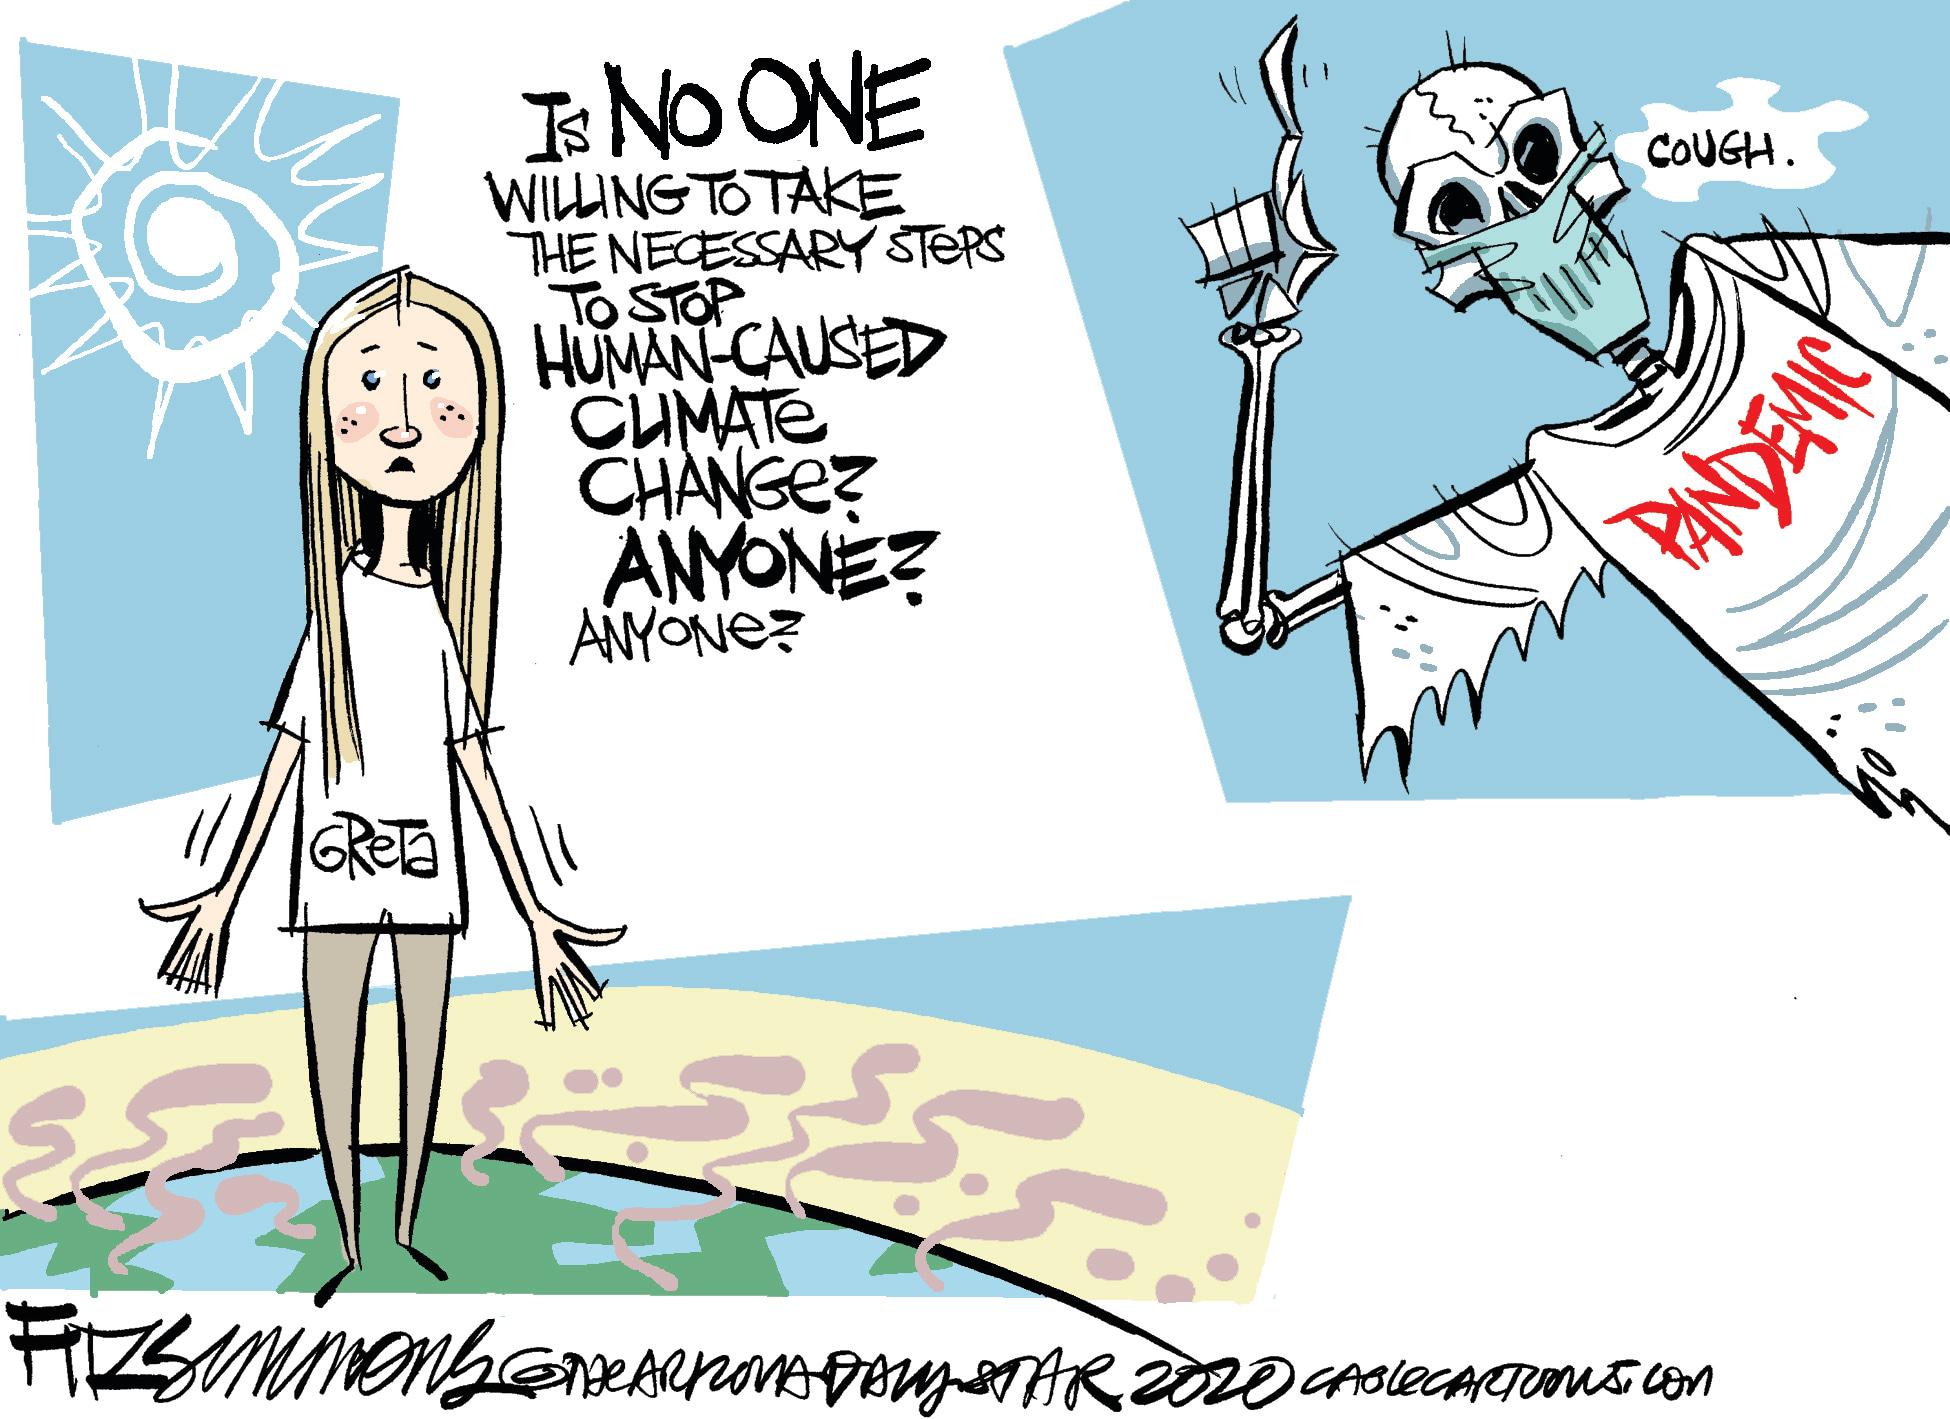 Political cartoons - the 'funny' pics thread.-pandemic-david-fitzsimmons-arizona-star-tucson